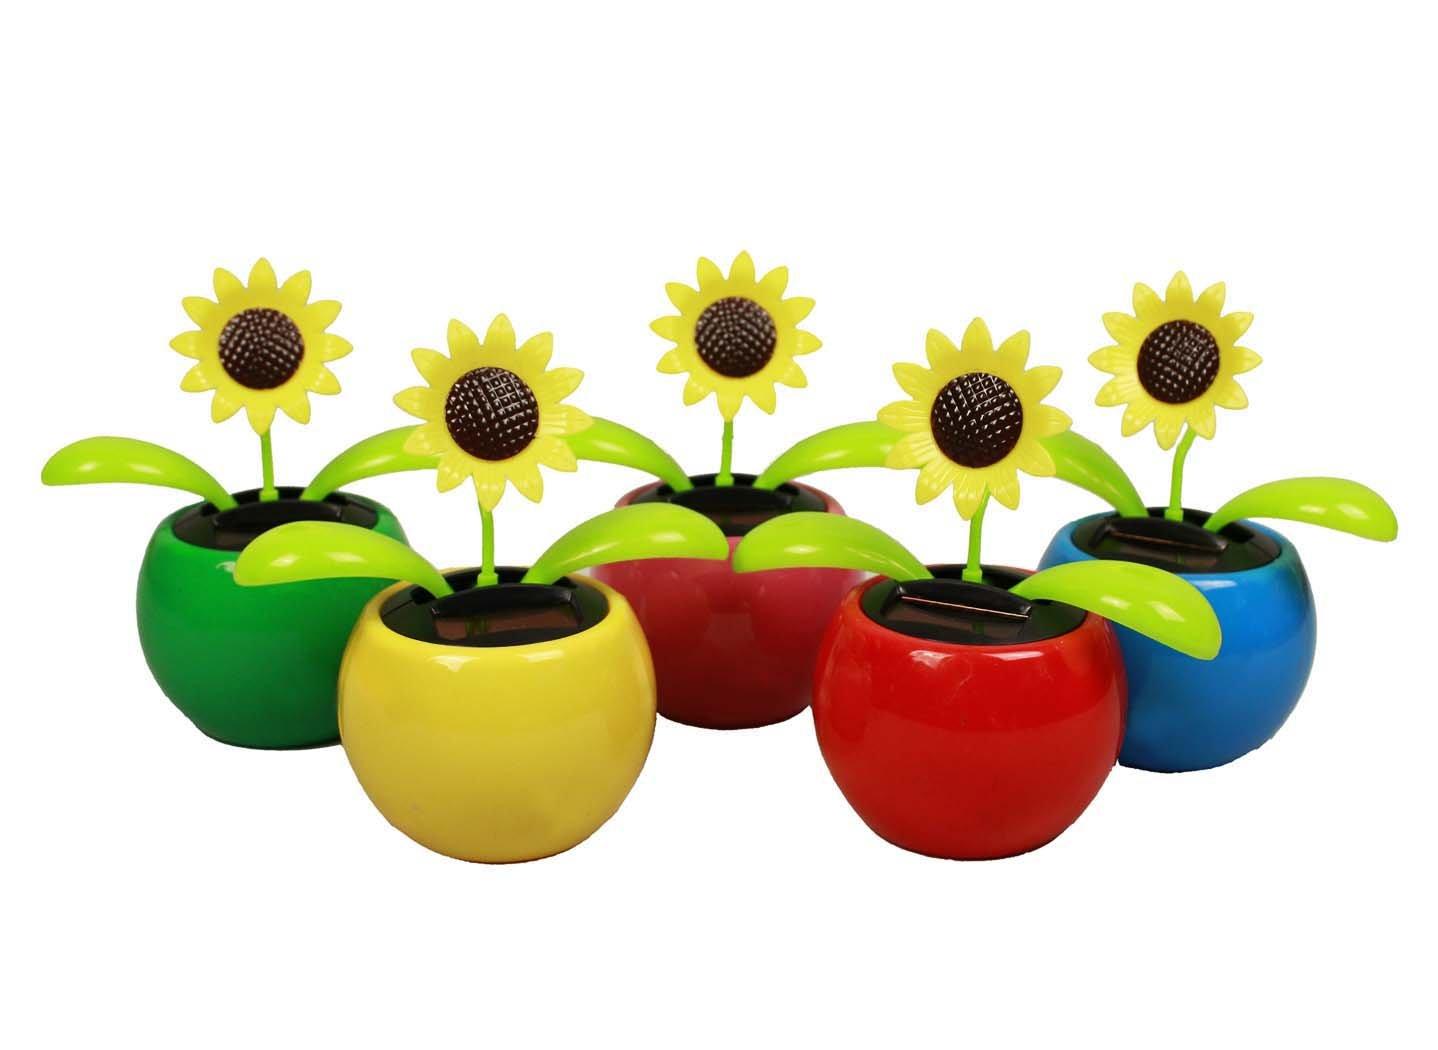 HAAC Solar Wackelblume Blume Sonne